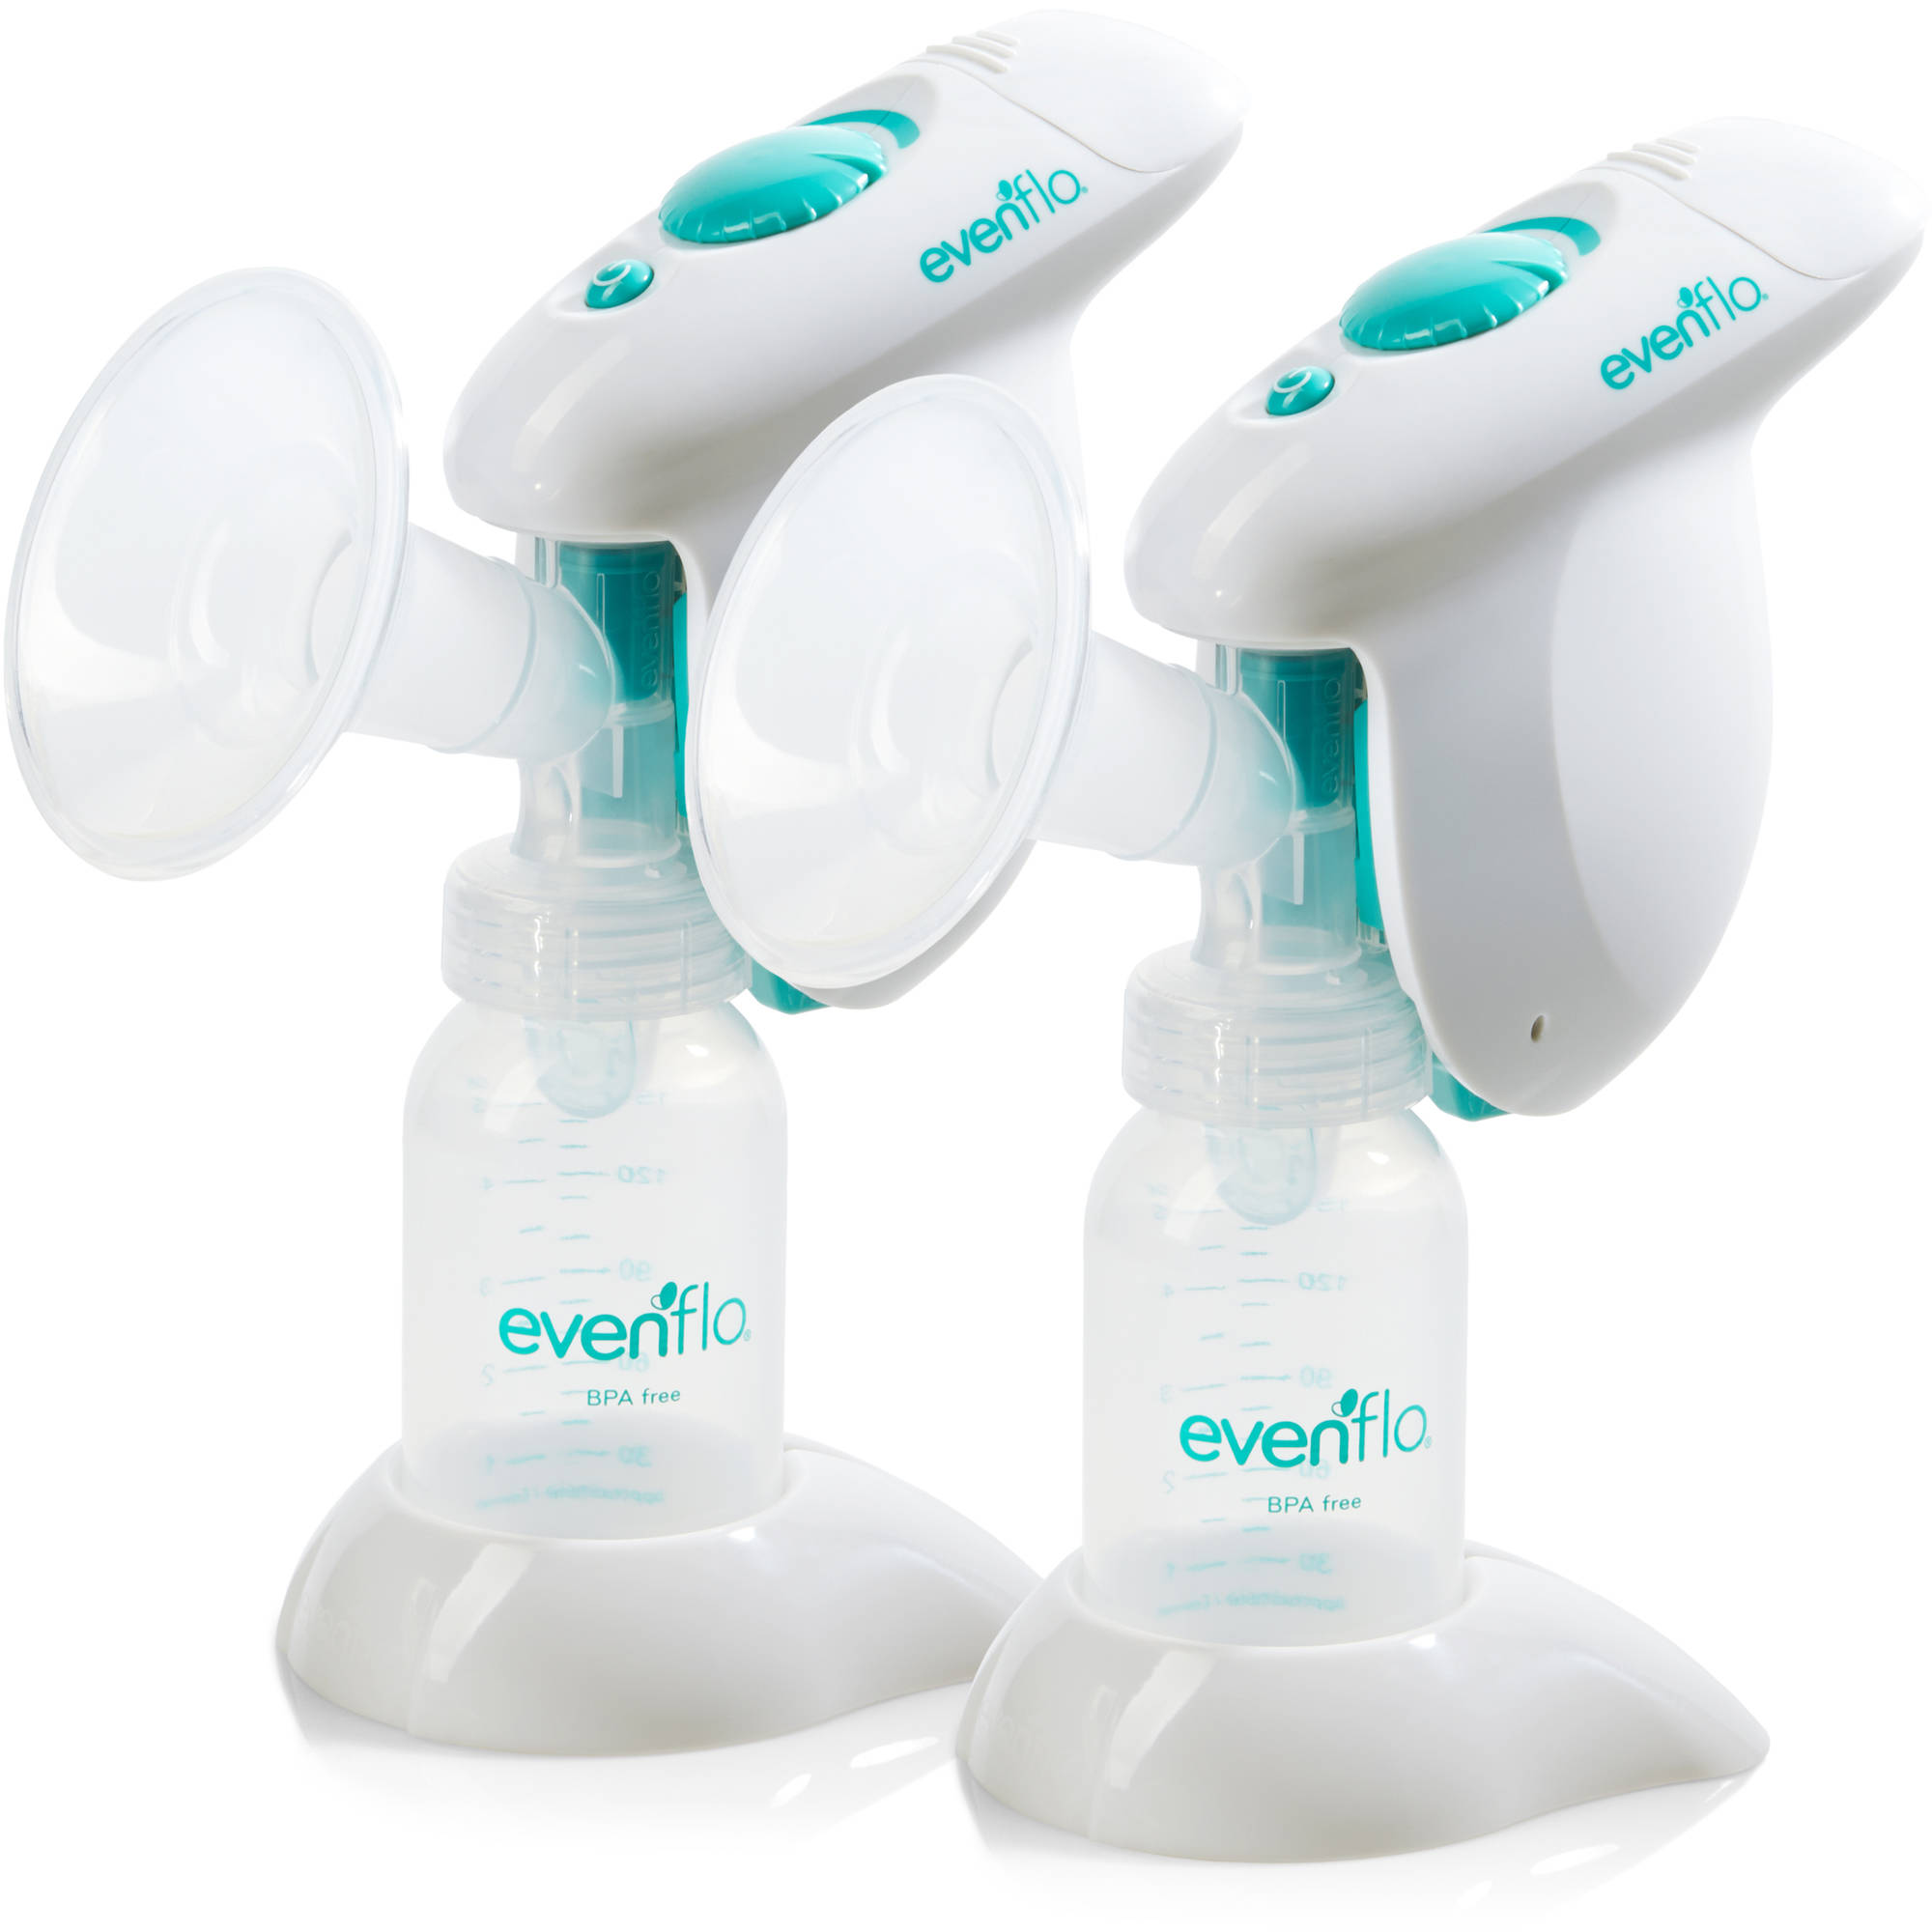 Evenflo Dual Electric Breast Pump